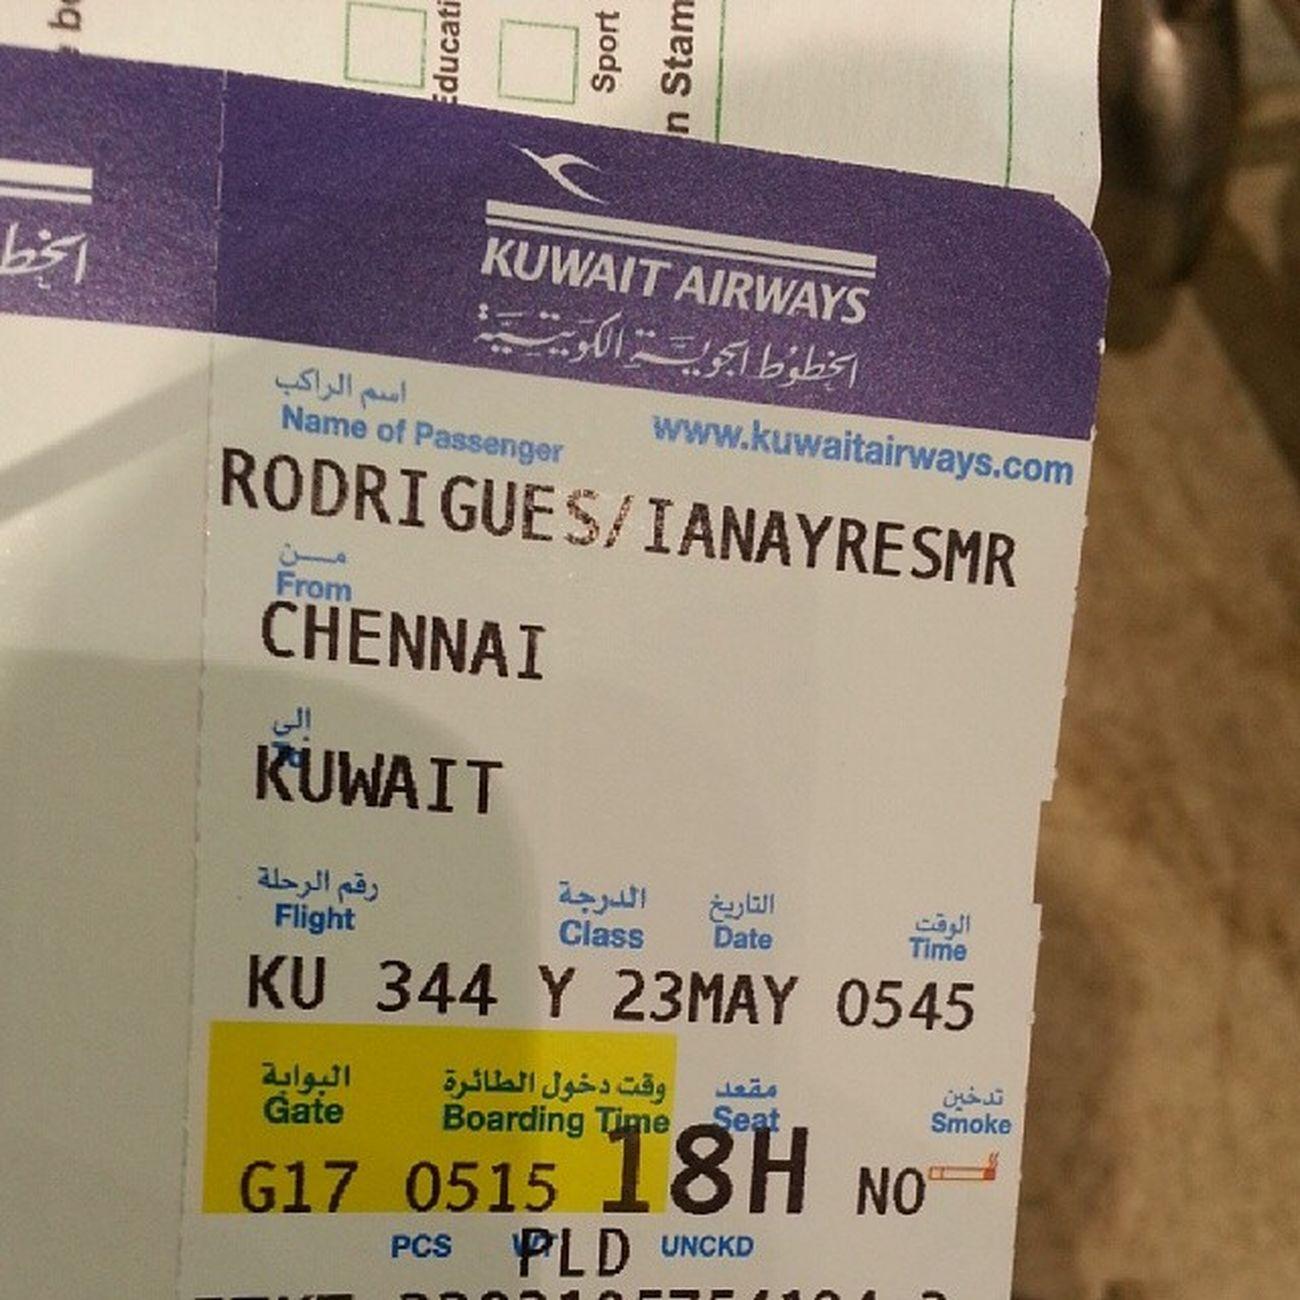 KuwaitAirways Backfromvacation Kuwait Q8 Flight Chennai India Gonnamissu HighTimes Boom